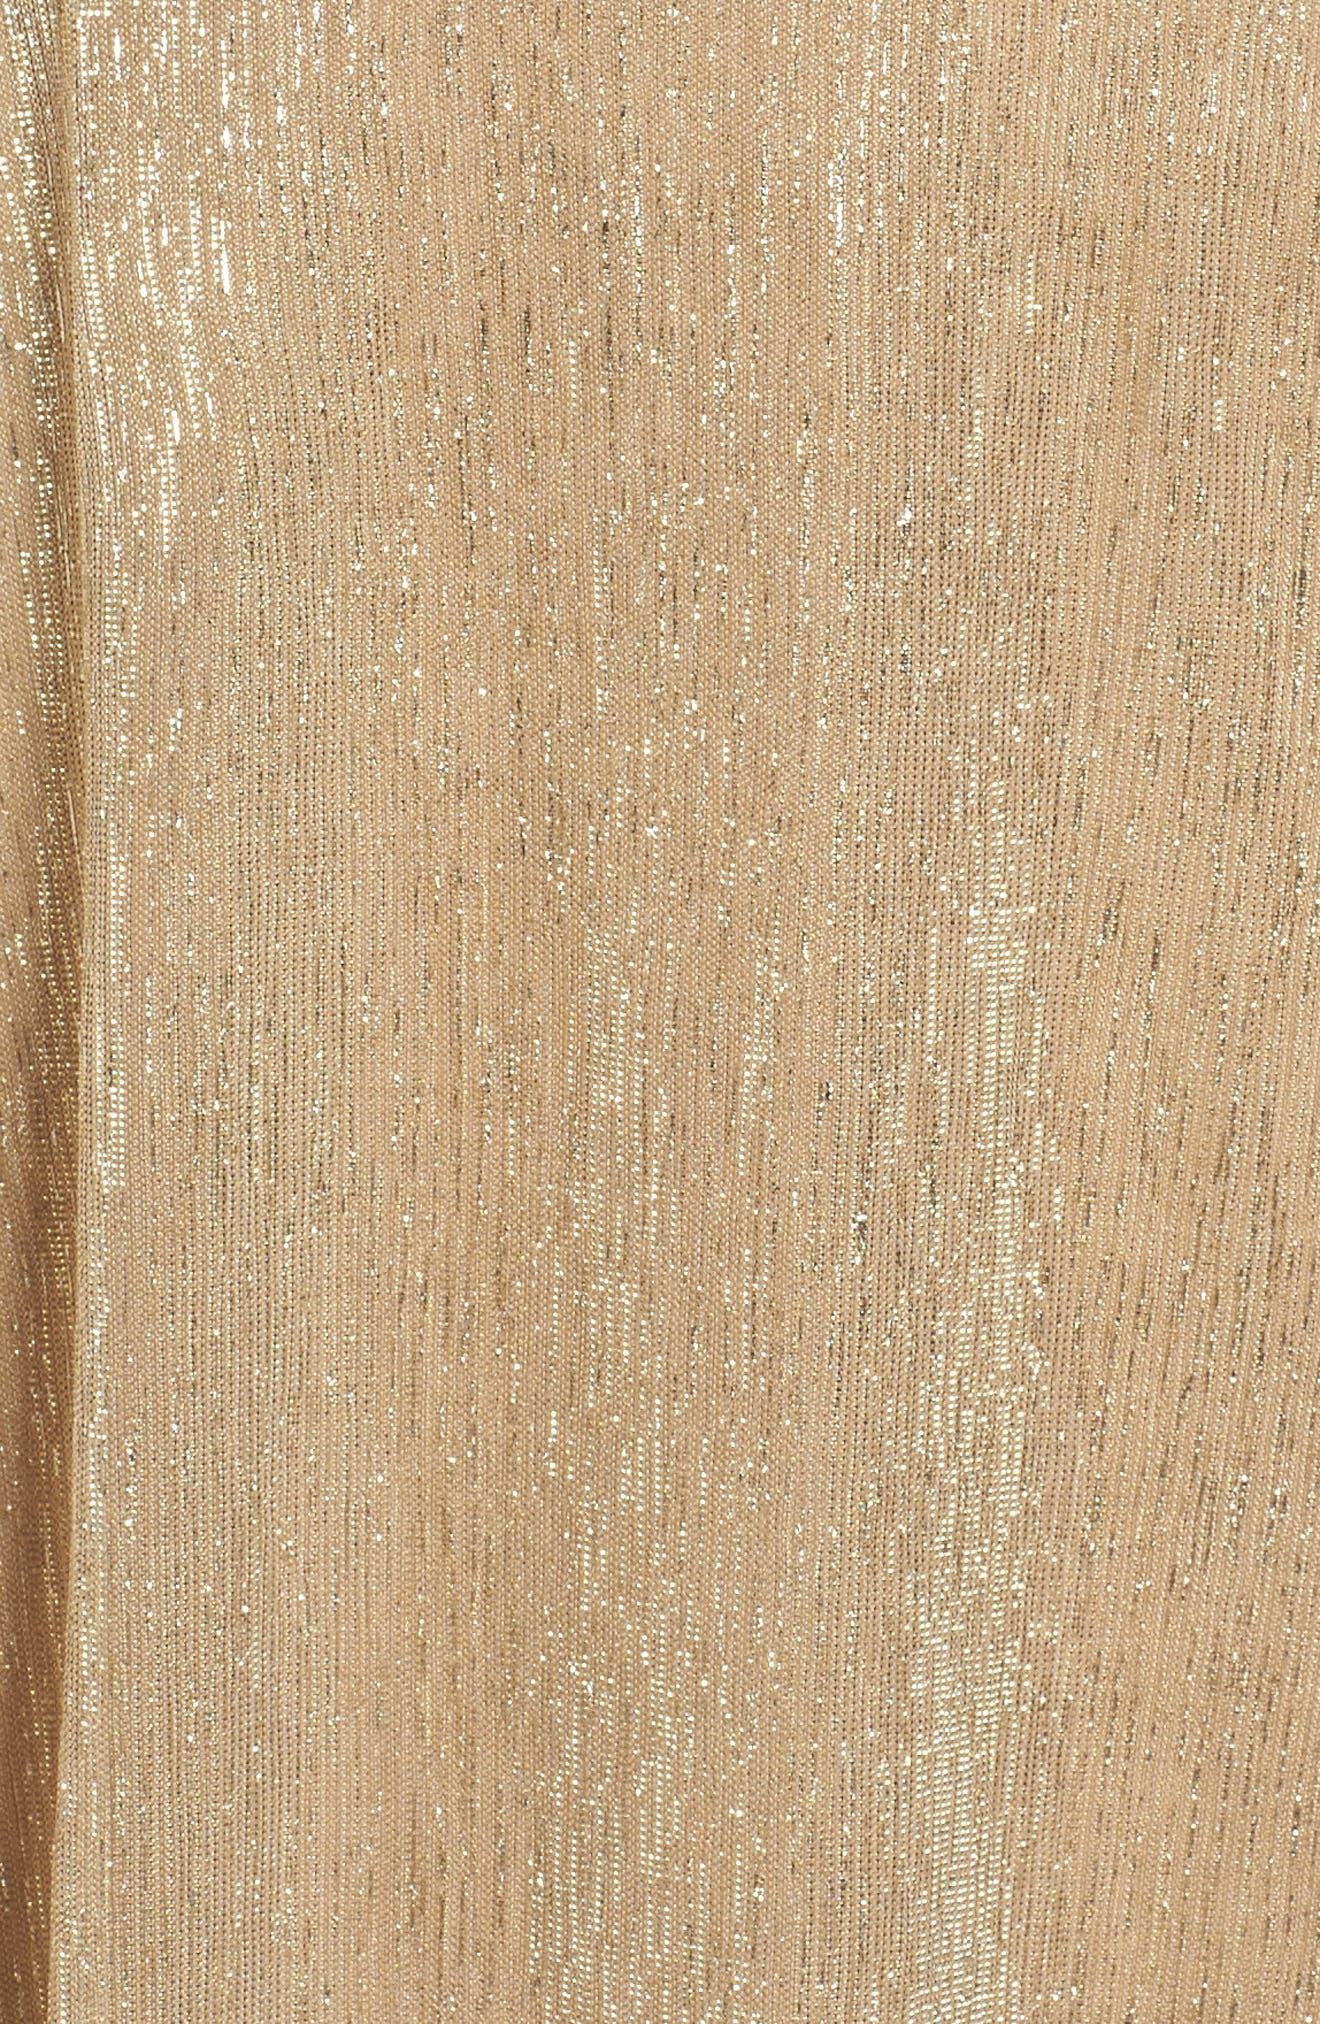 Cold Shoulder Gown,                             Alternate thumbnail 5, color,                             710